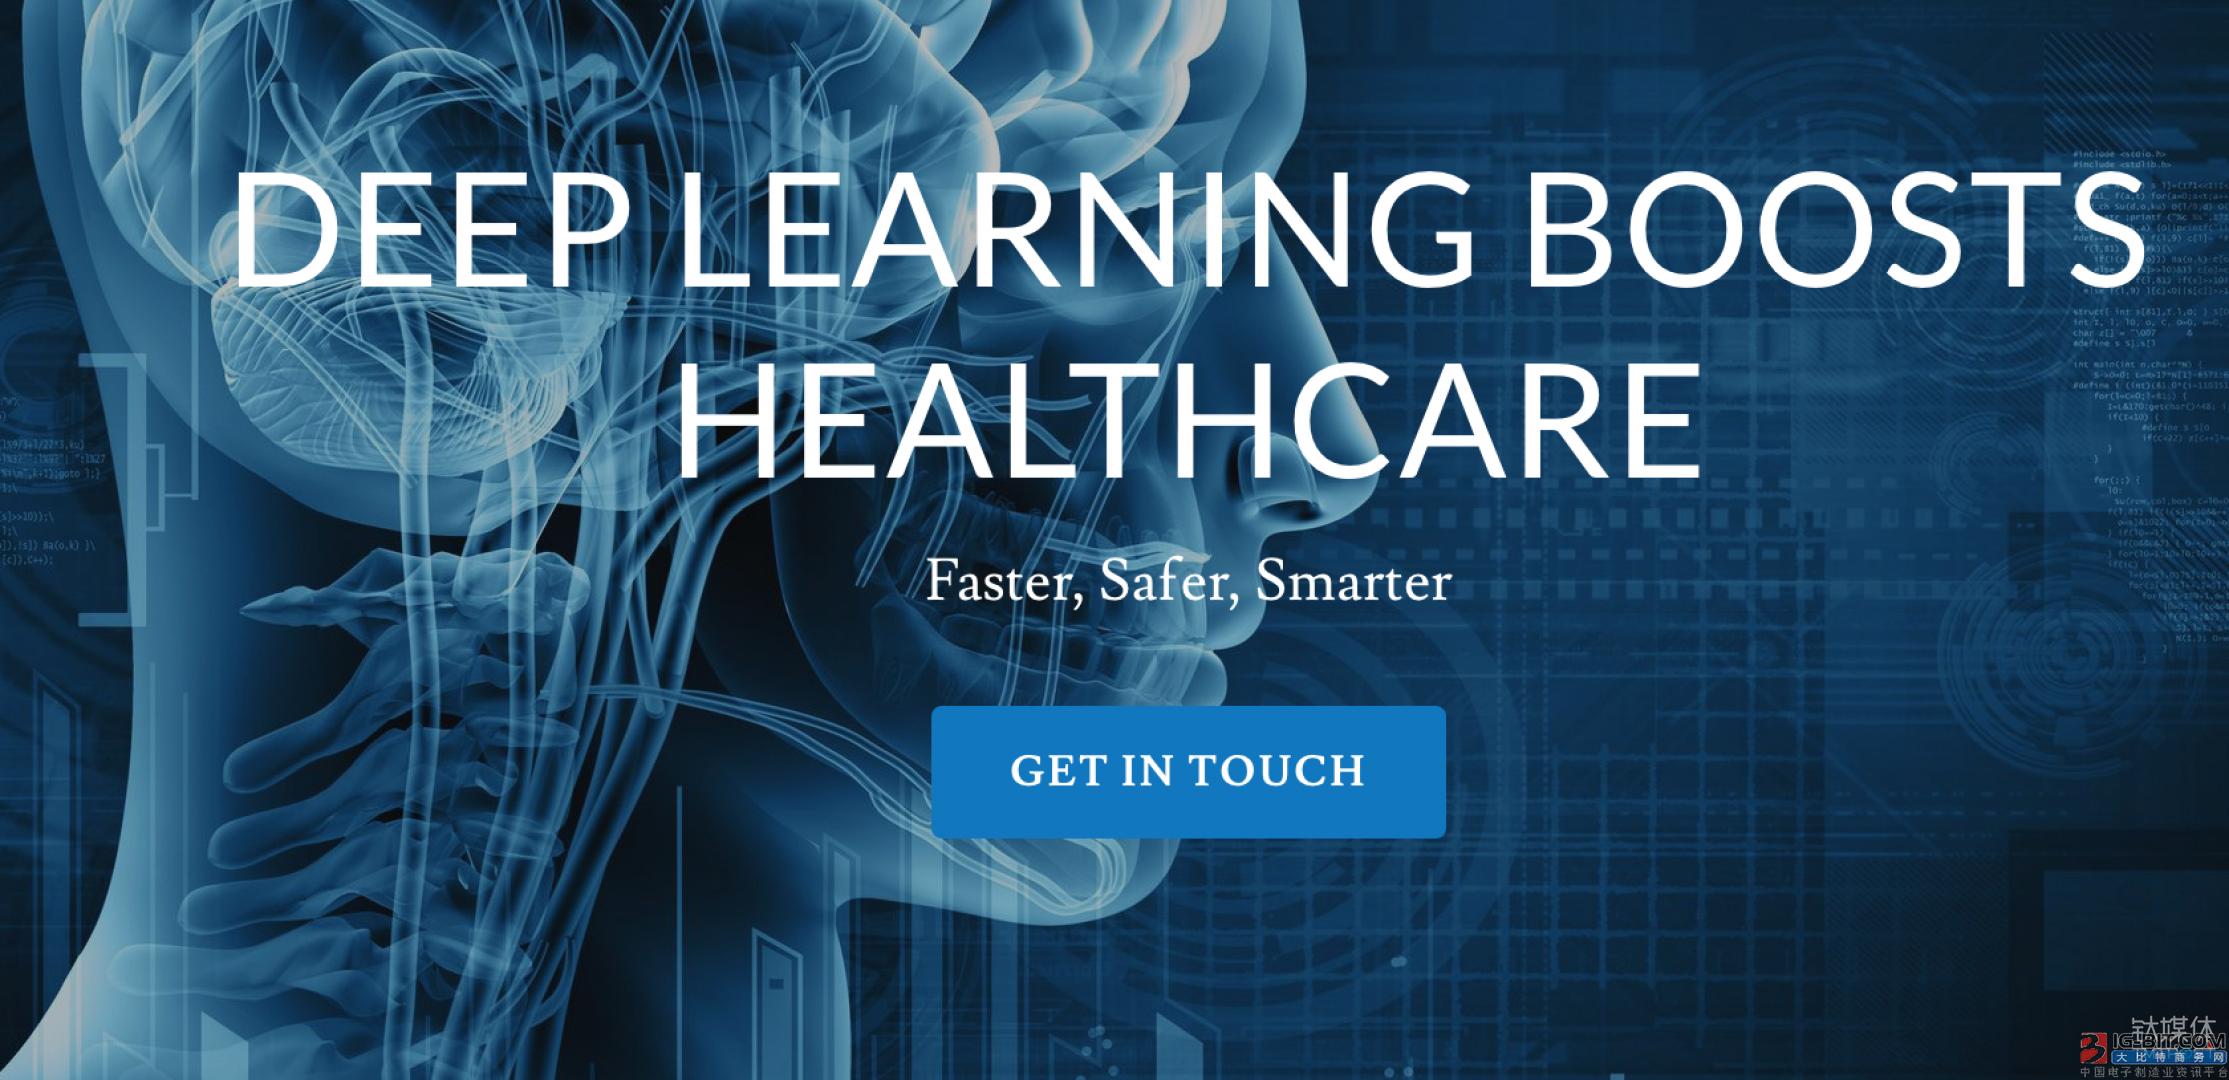 Facebook刚宣布要做的加速医学成像技术,这家公司已经把TA商业化了